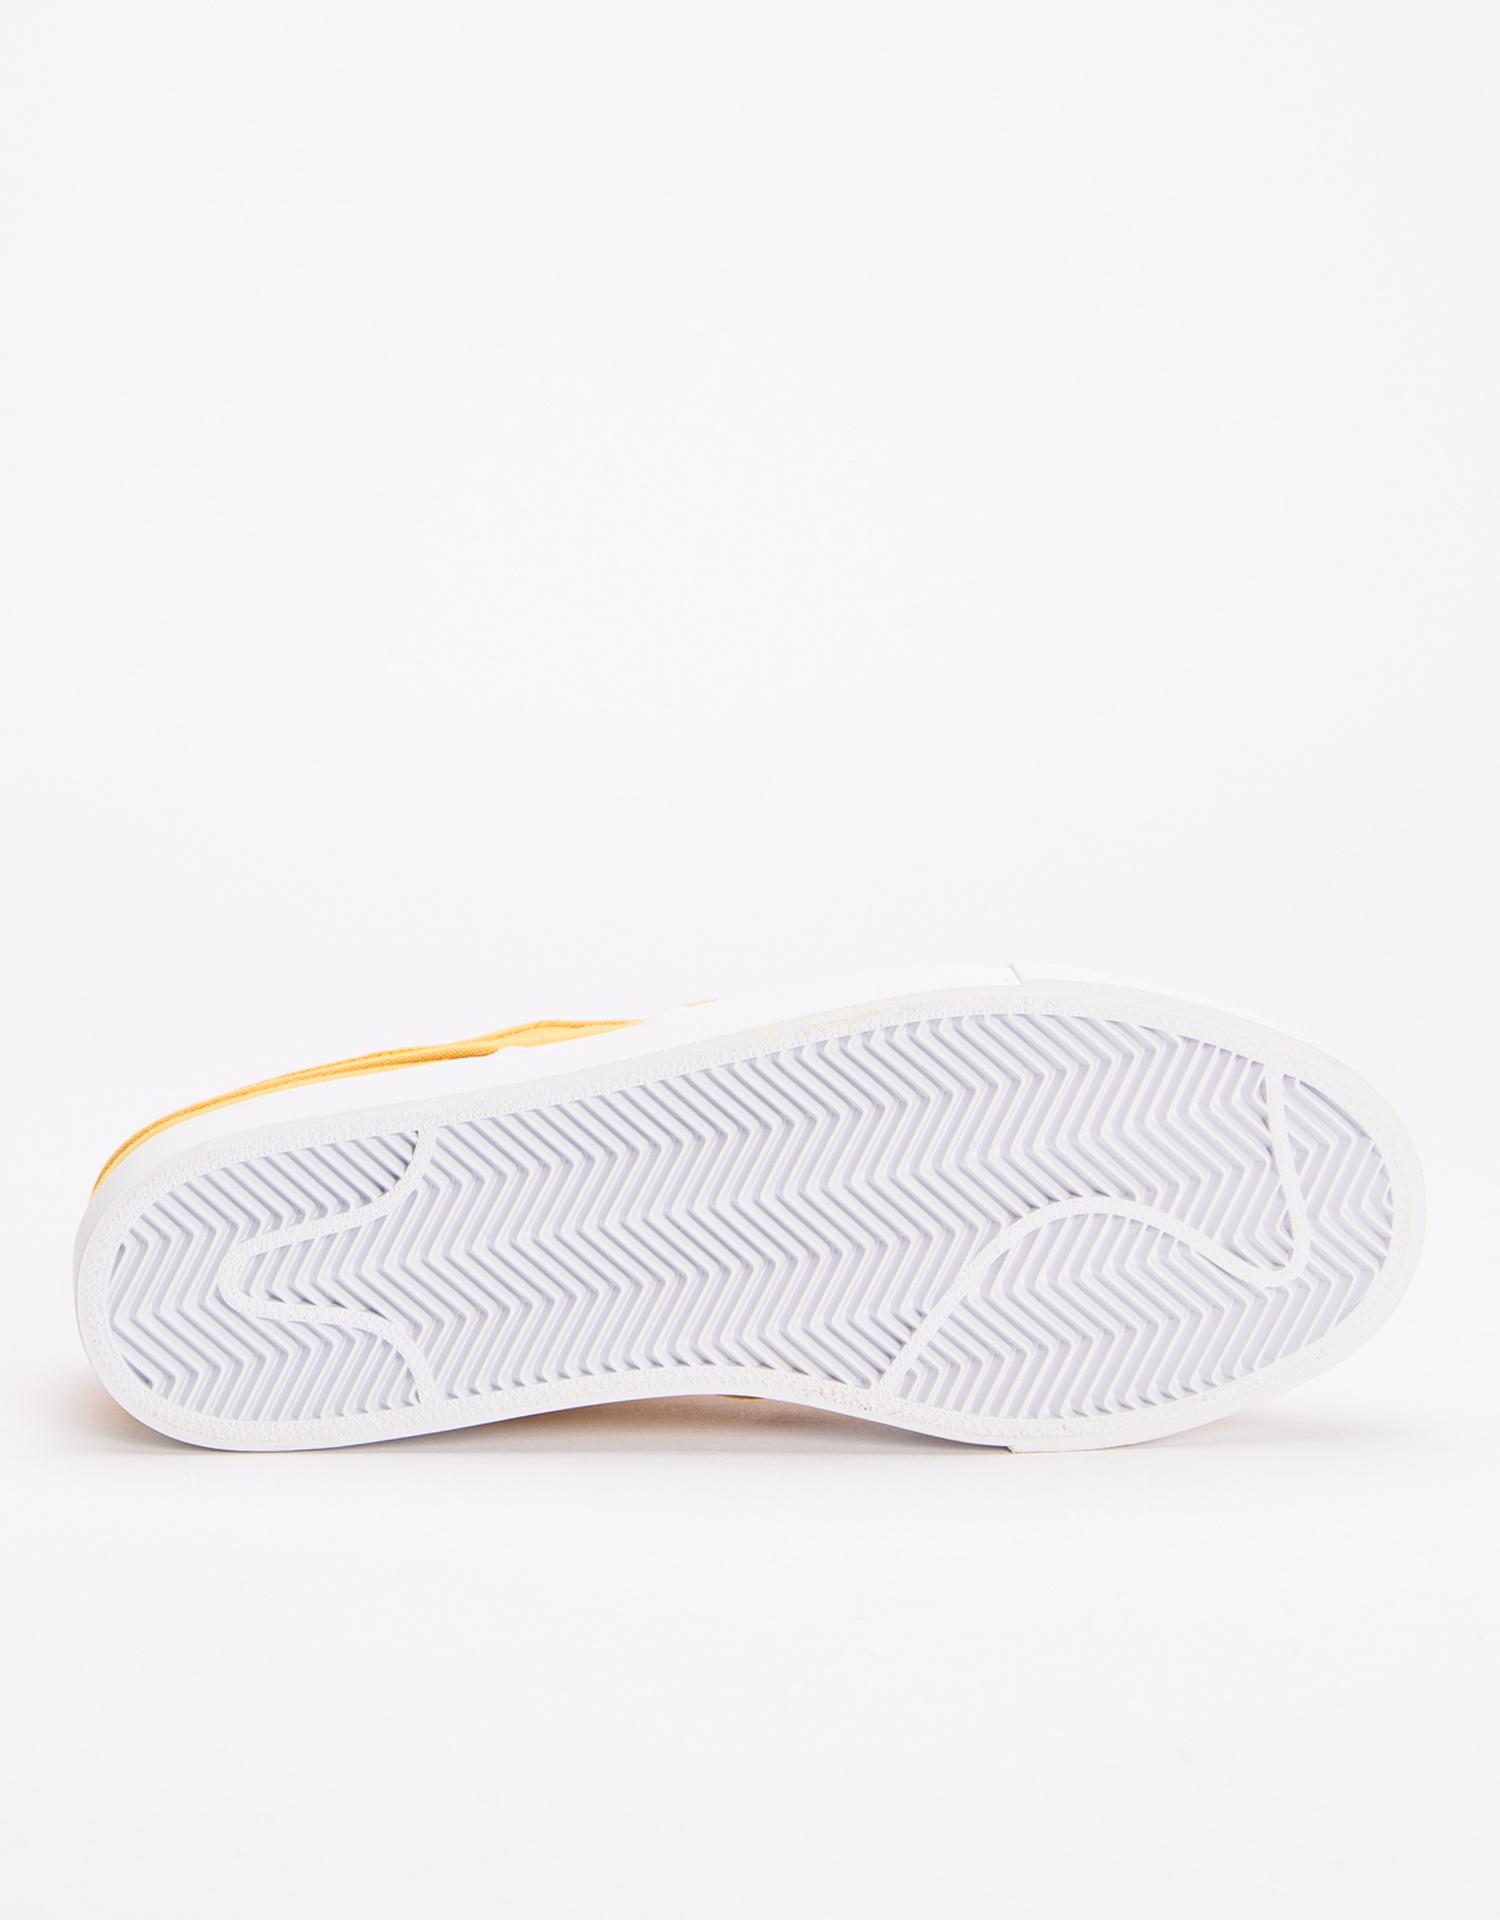 Nike Sb Zoom Stefan Janoski Slip Yellow Ochre/Yellow Ochre-White